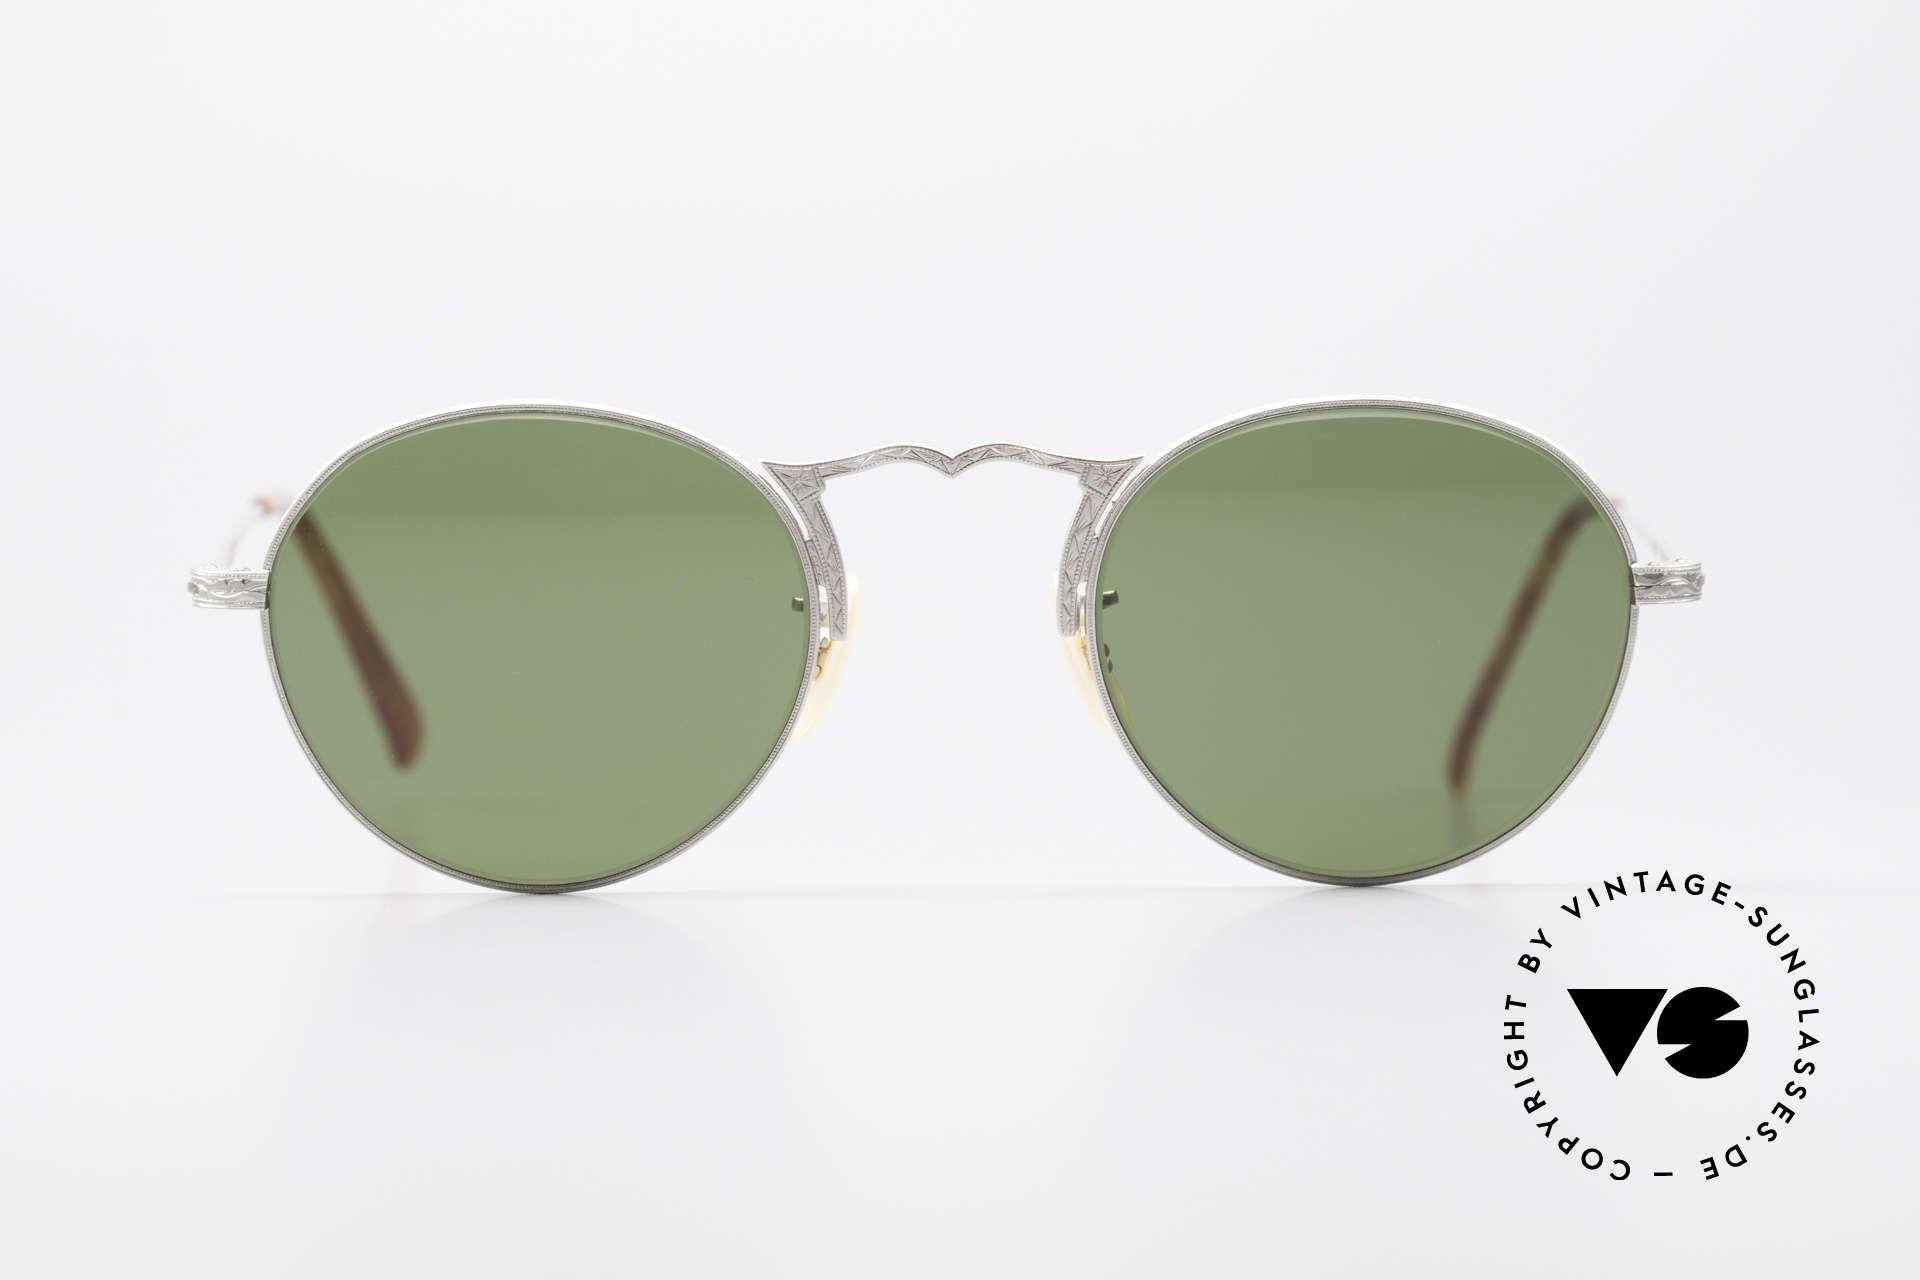 Sonnenbrillen Oliver Peoples OP7M Rare Vintage Sonnenbrille